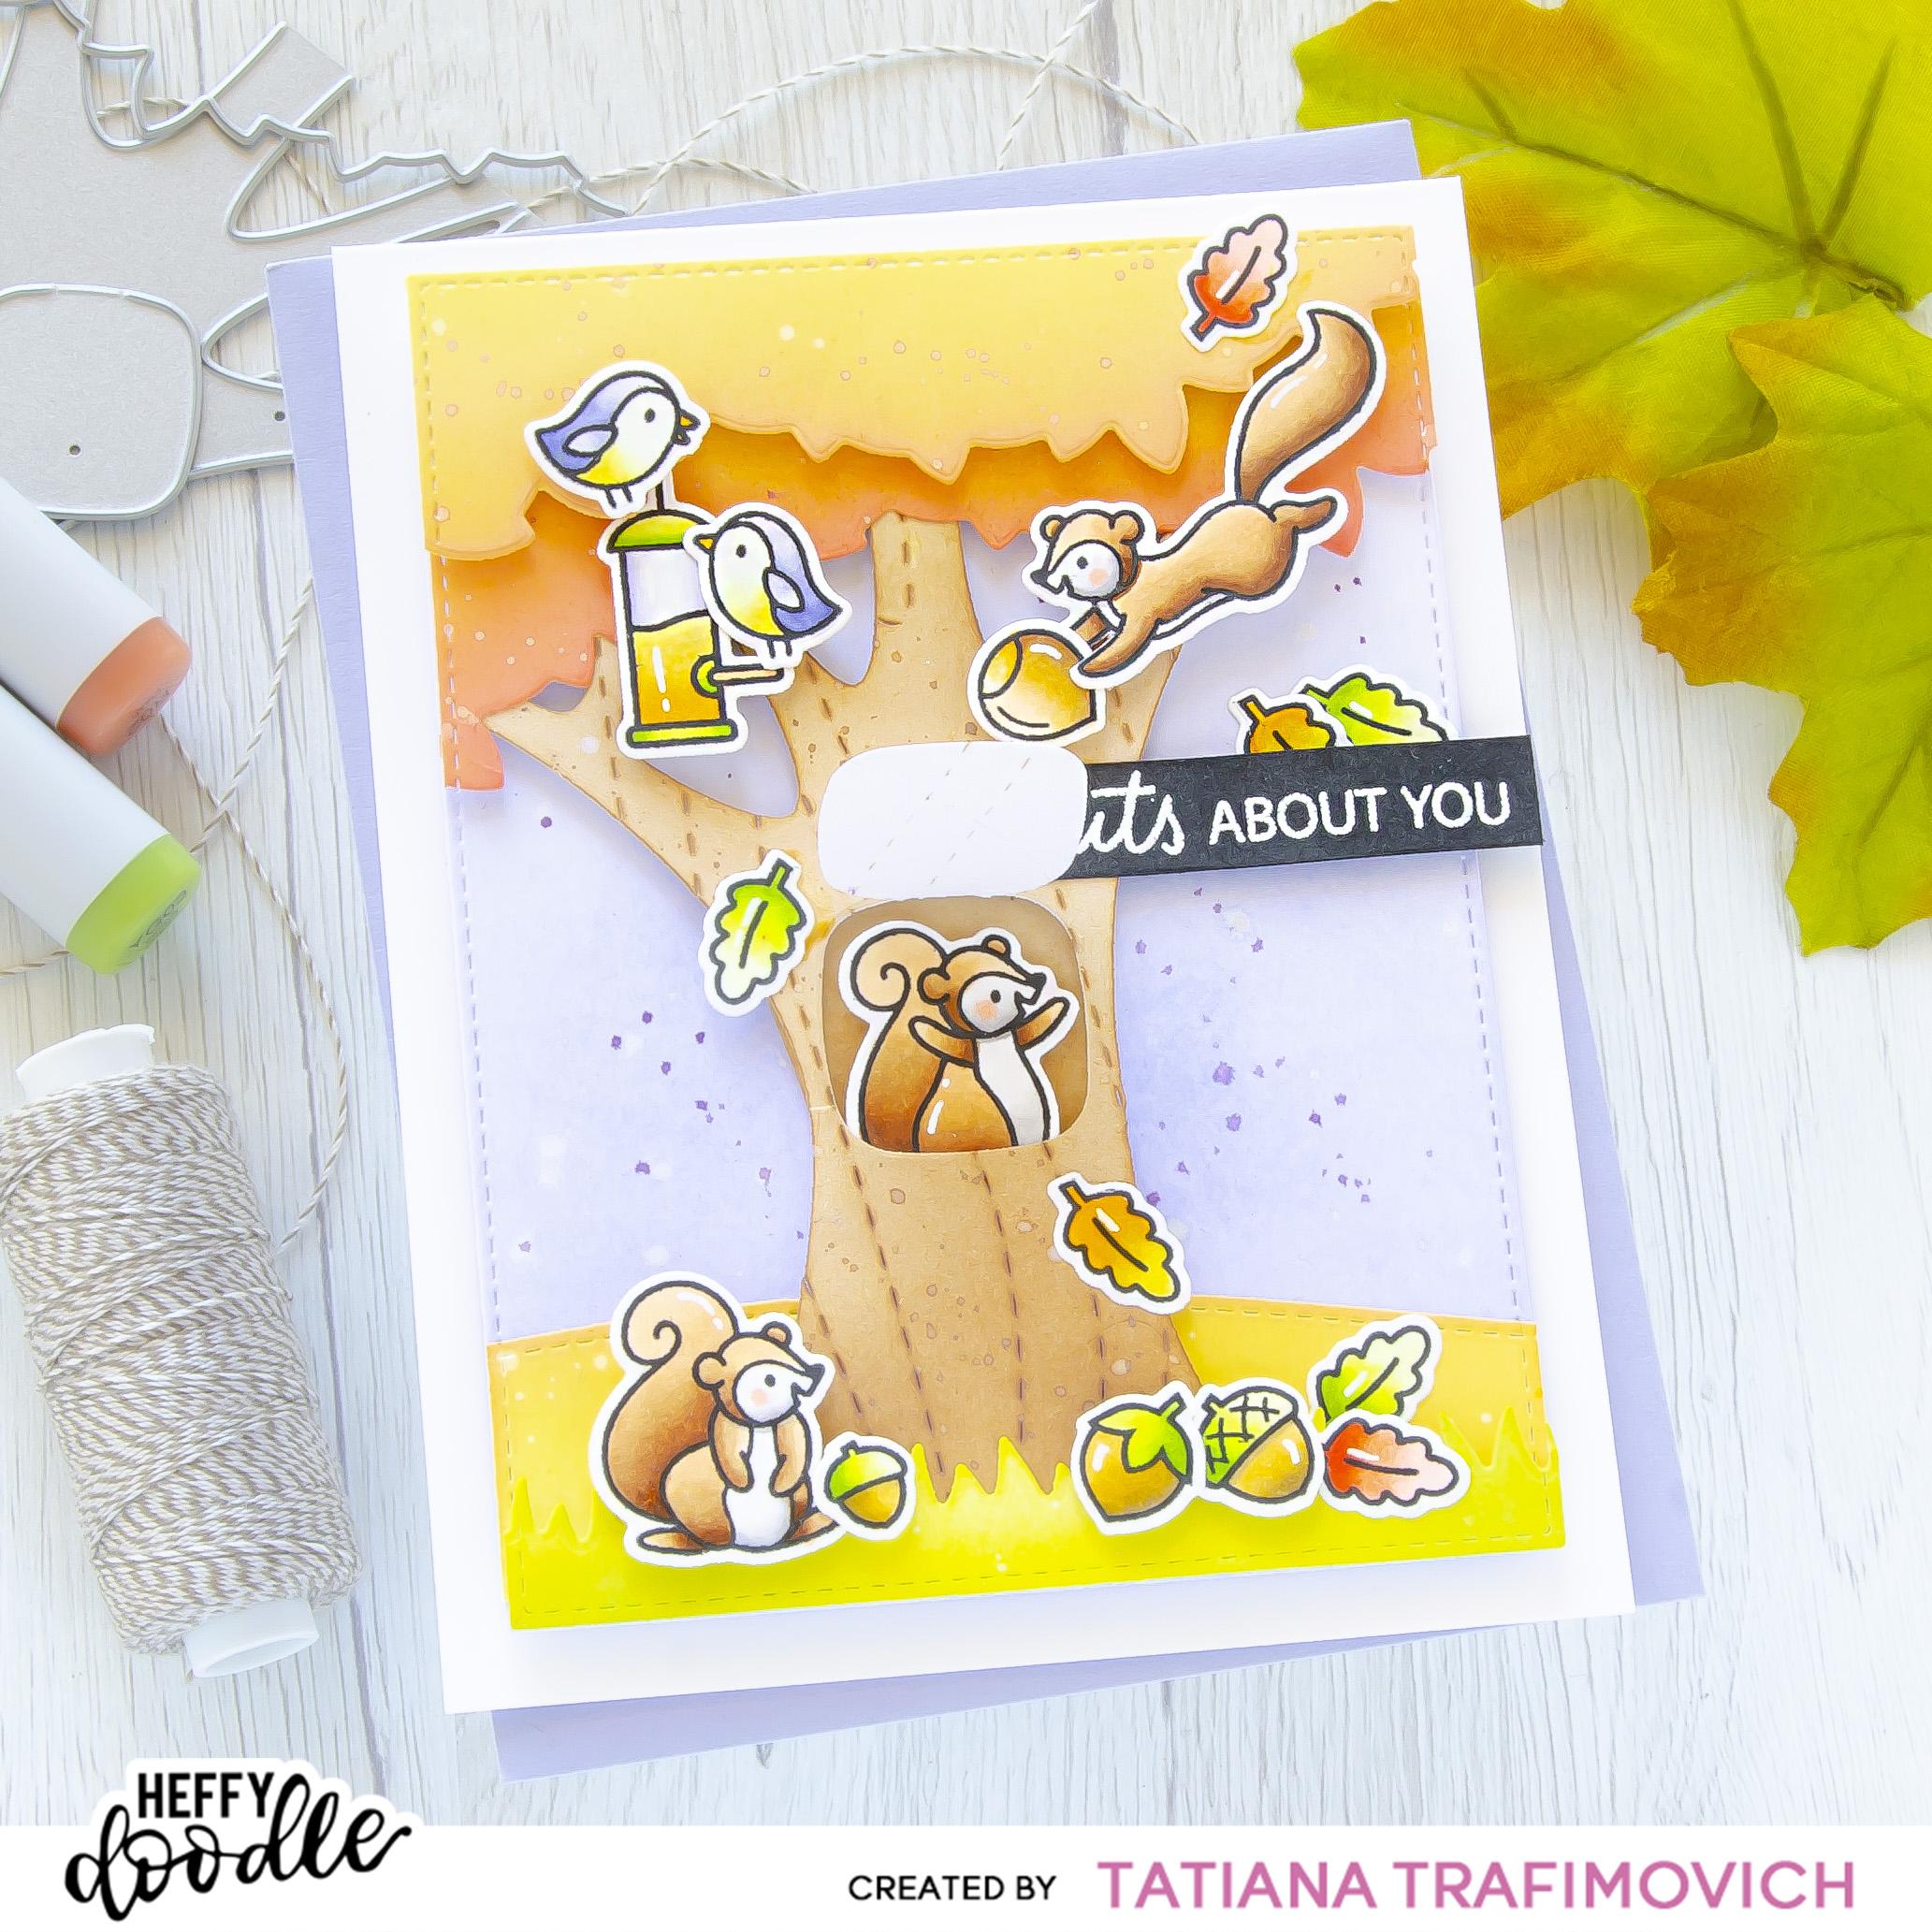 I'm NUTS About You #handmade card by Tatiana Trafimovich #tatianacraftandart - Nuts About You stamp set by Heffy Doodle #heffydoodle